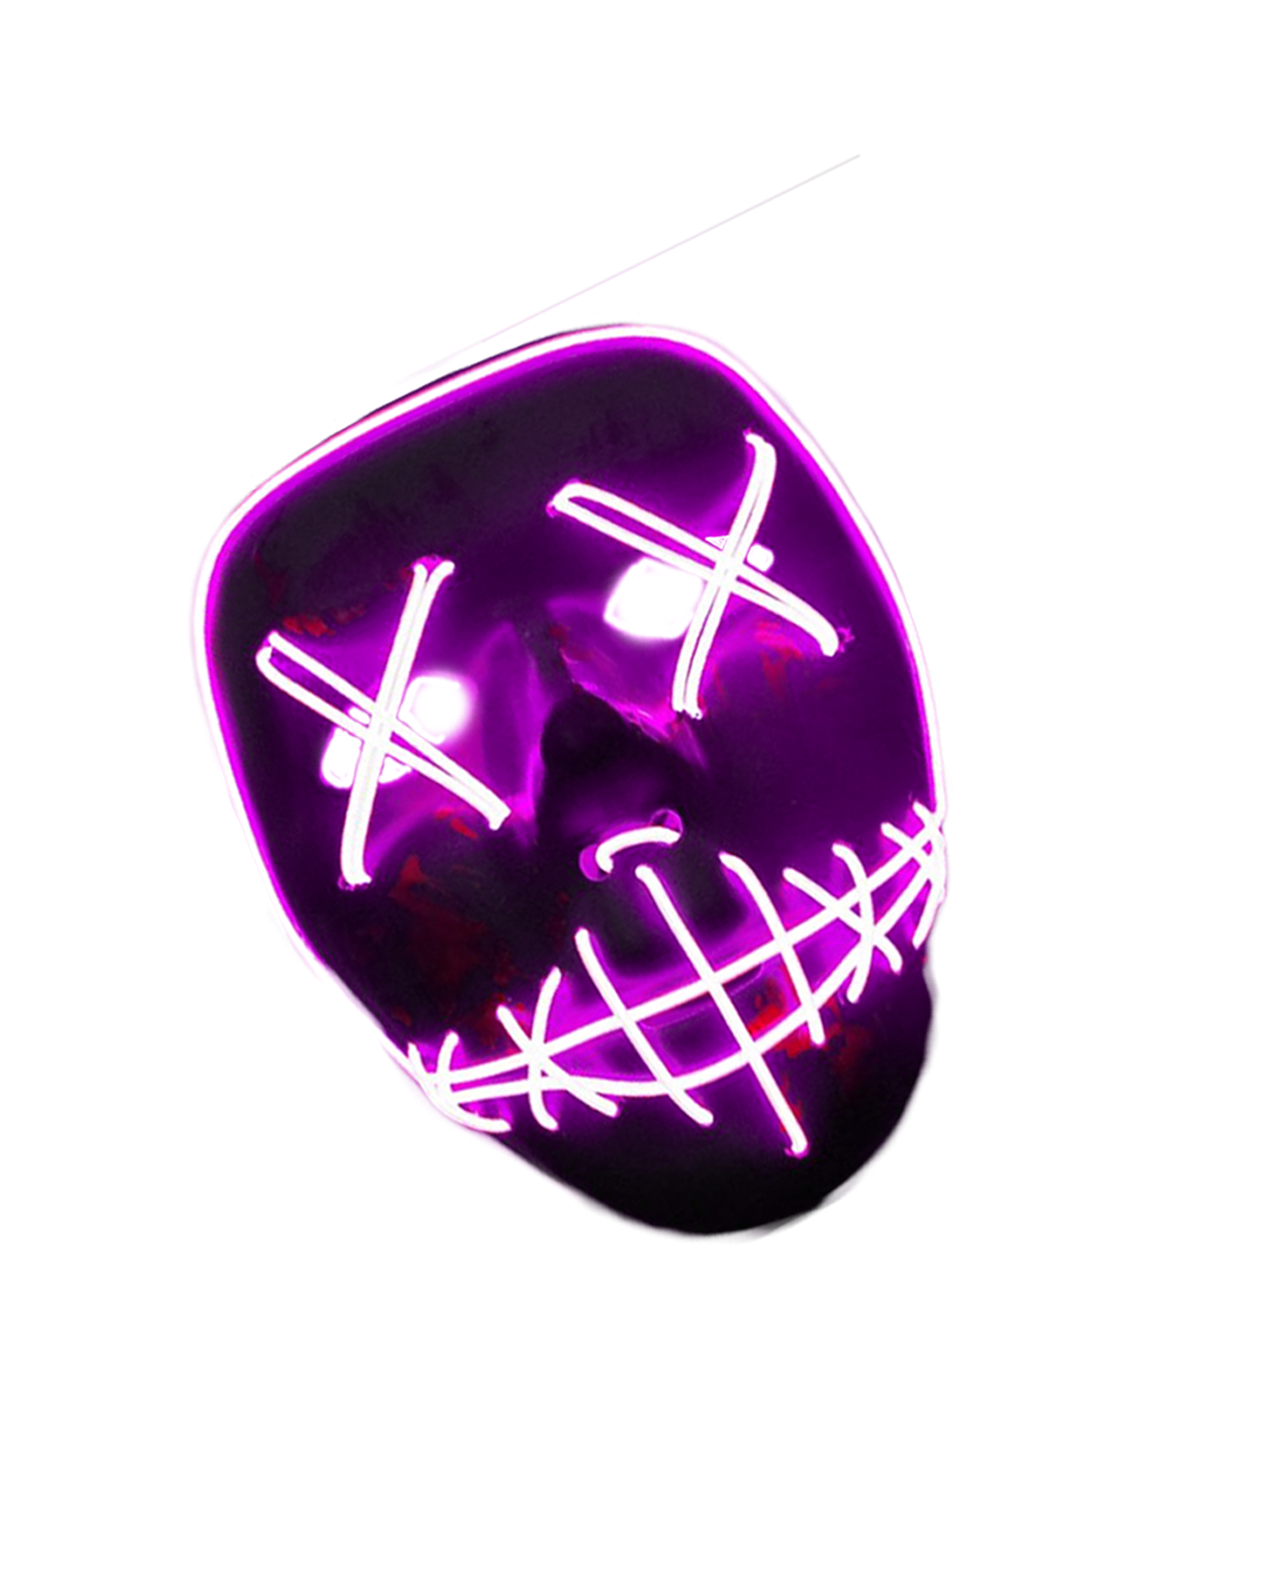 Jhakkaas Knowledge: 3D Hacker Neon Mask Photo Editing